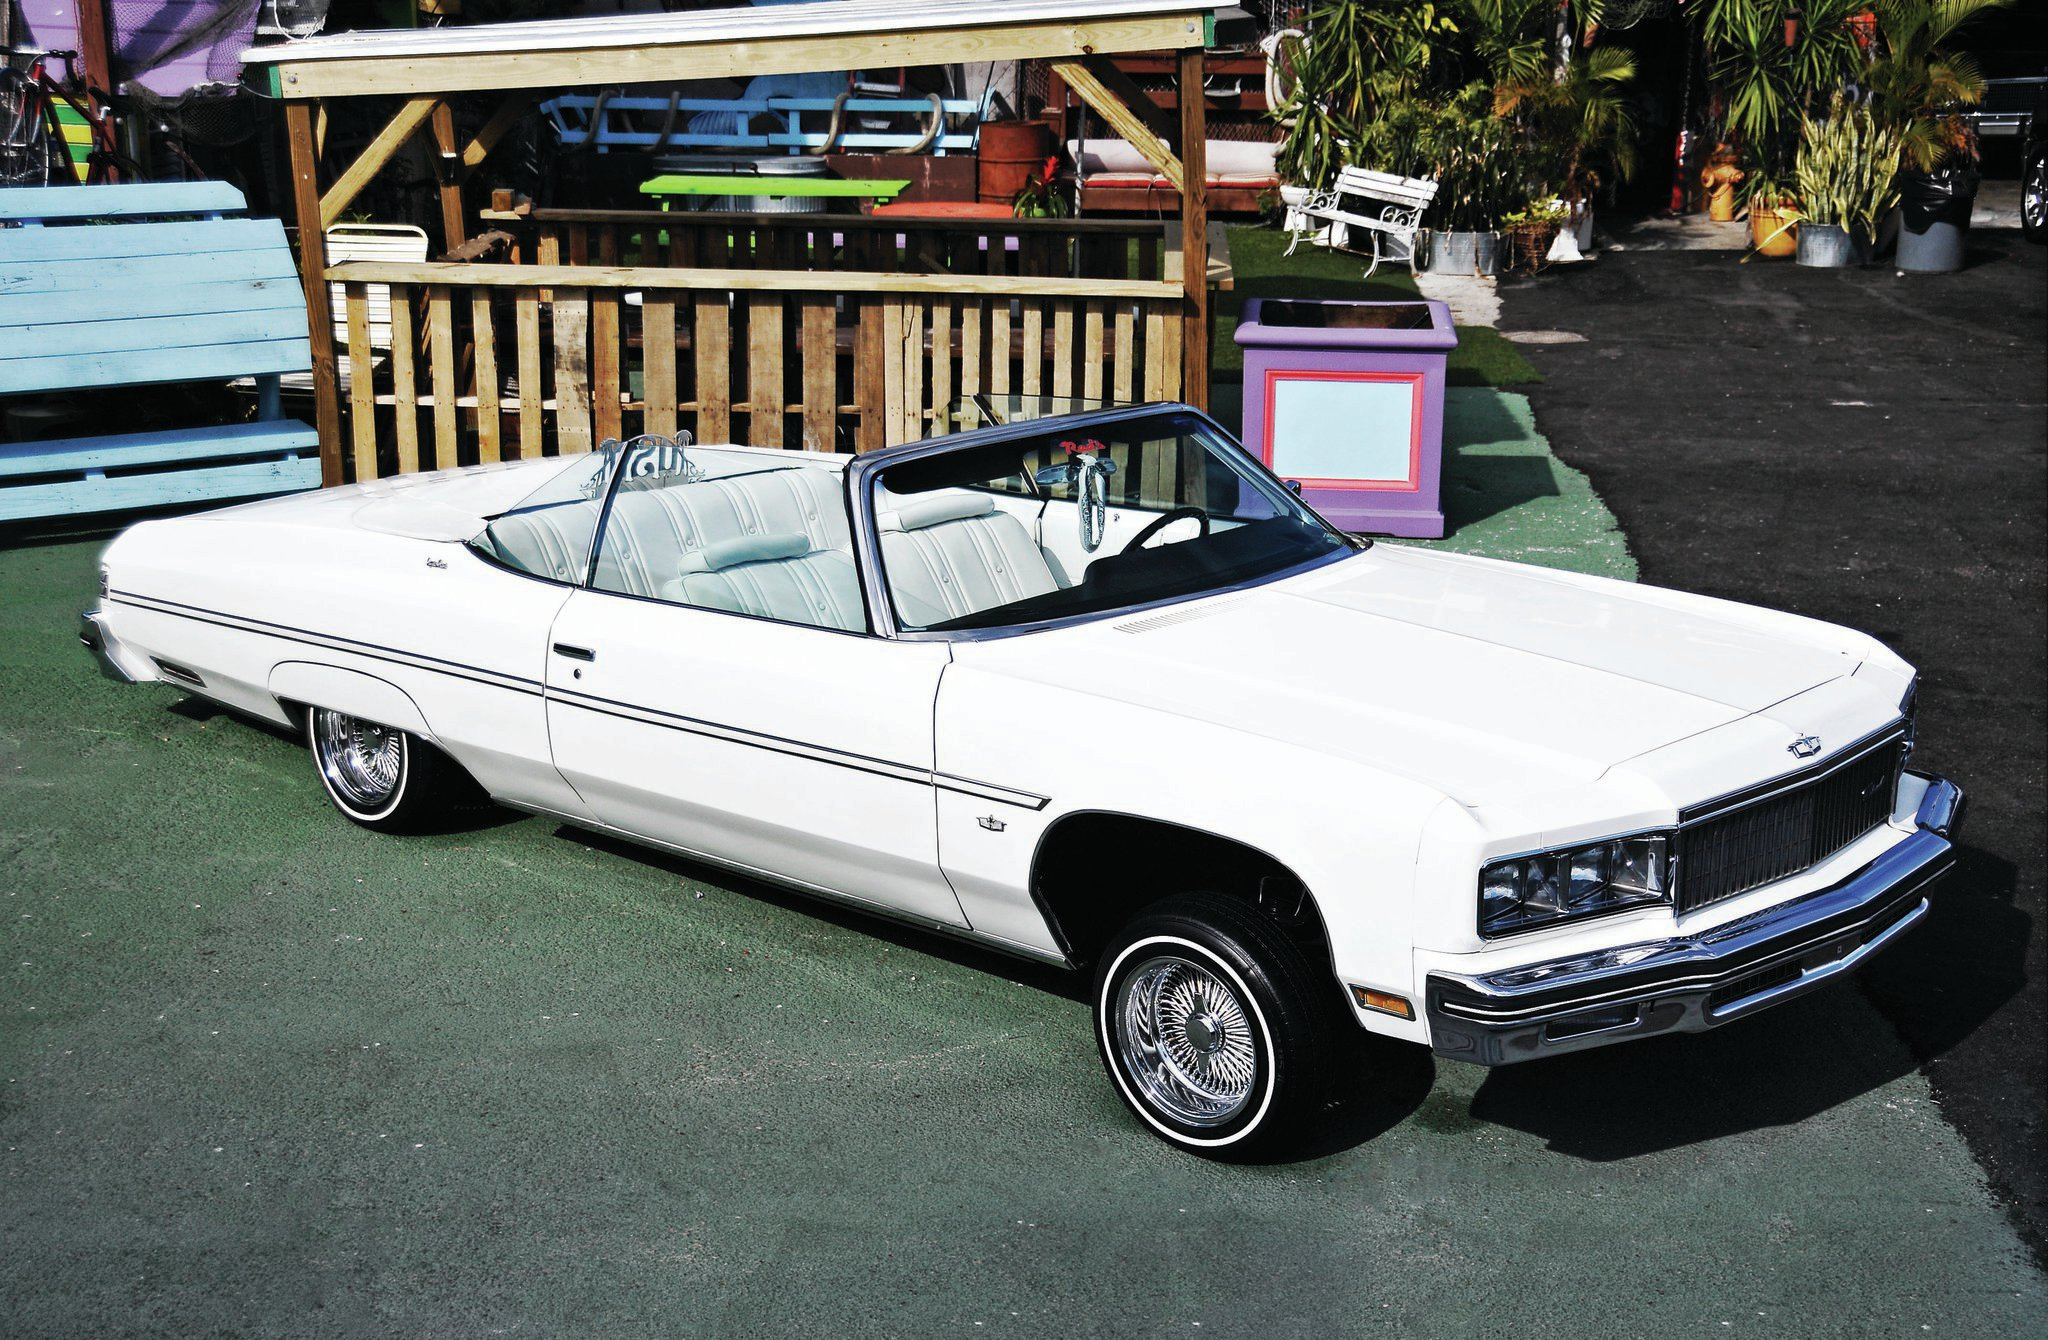 Chevrolet Monte Carlo 2015 >> 1975 Chevrolet Caprice Classic - Great White '75